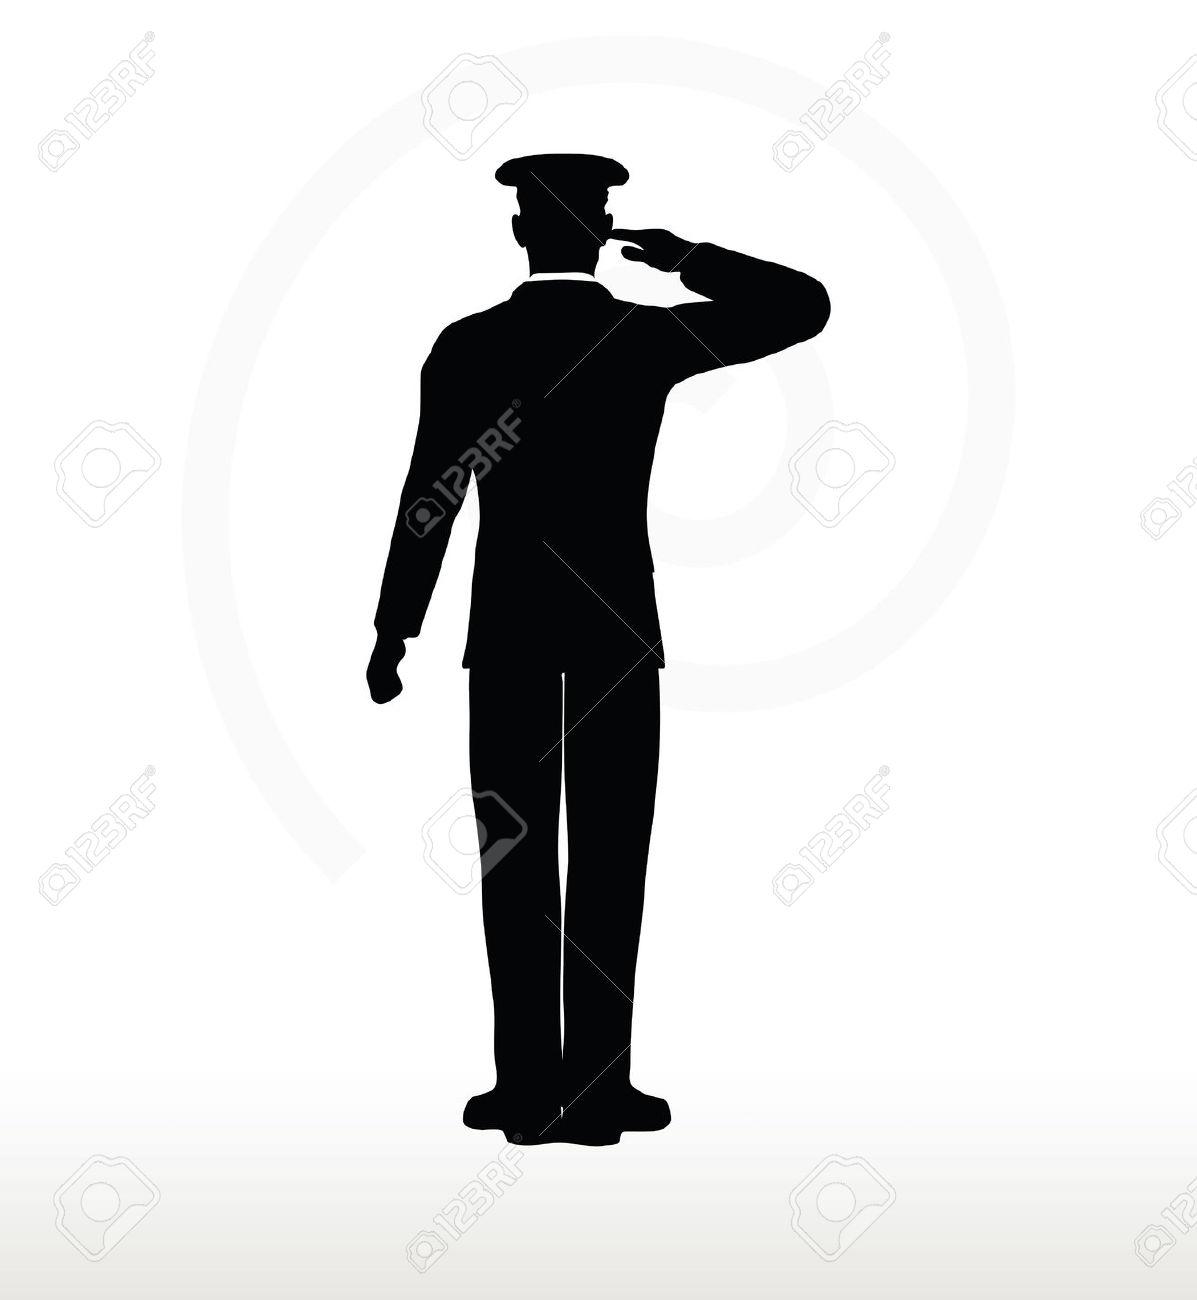 1197x1300 Navy Clipart Hand Salute